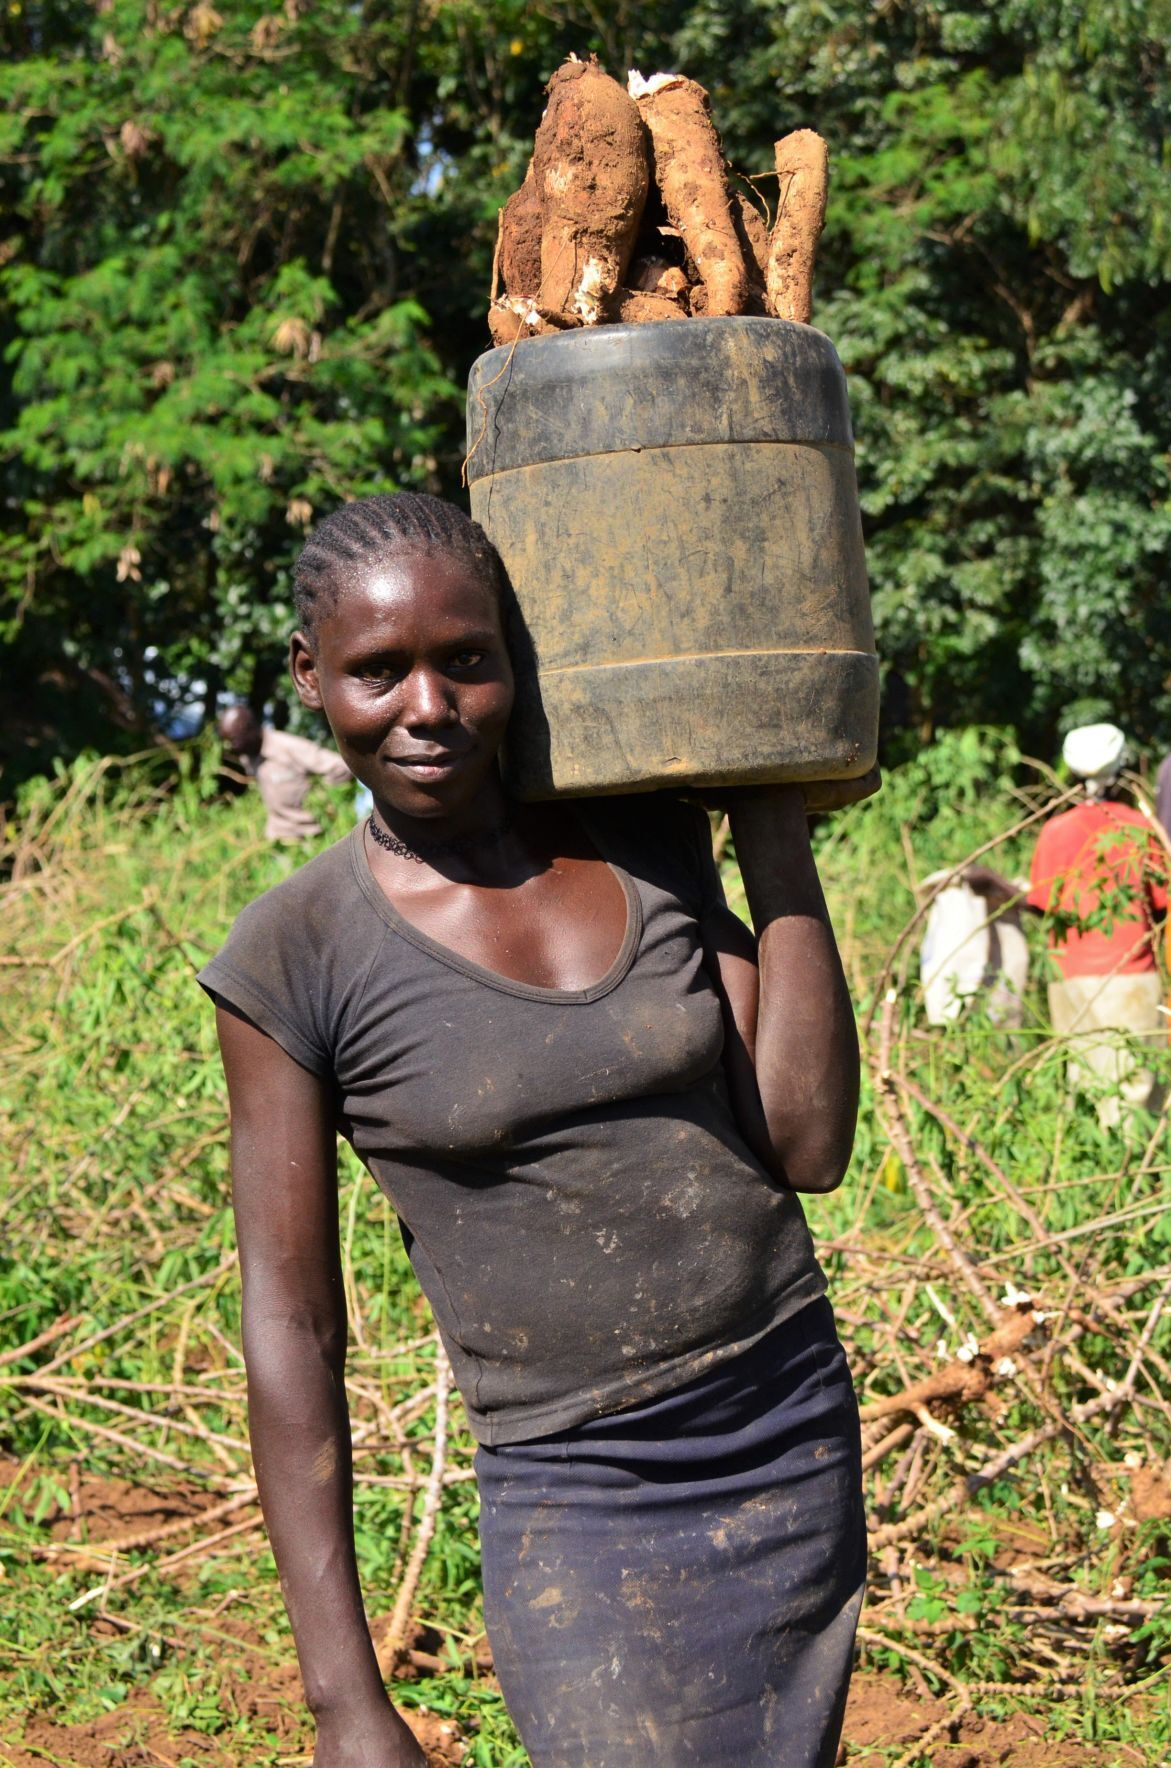 Kenyan farmer harvests cassava roots